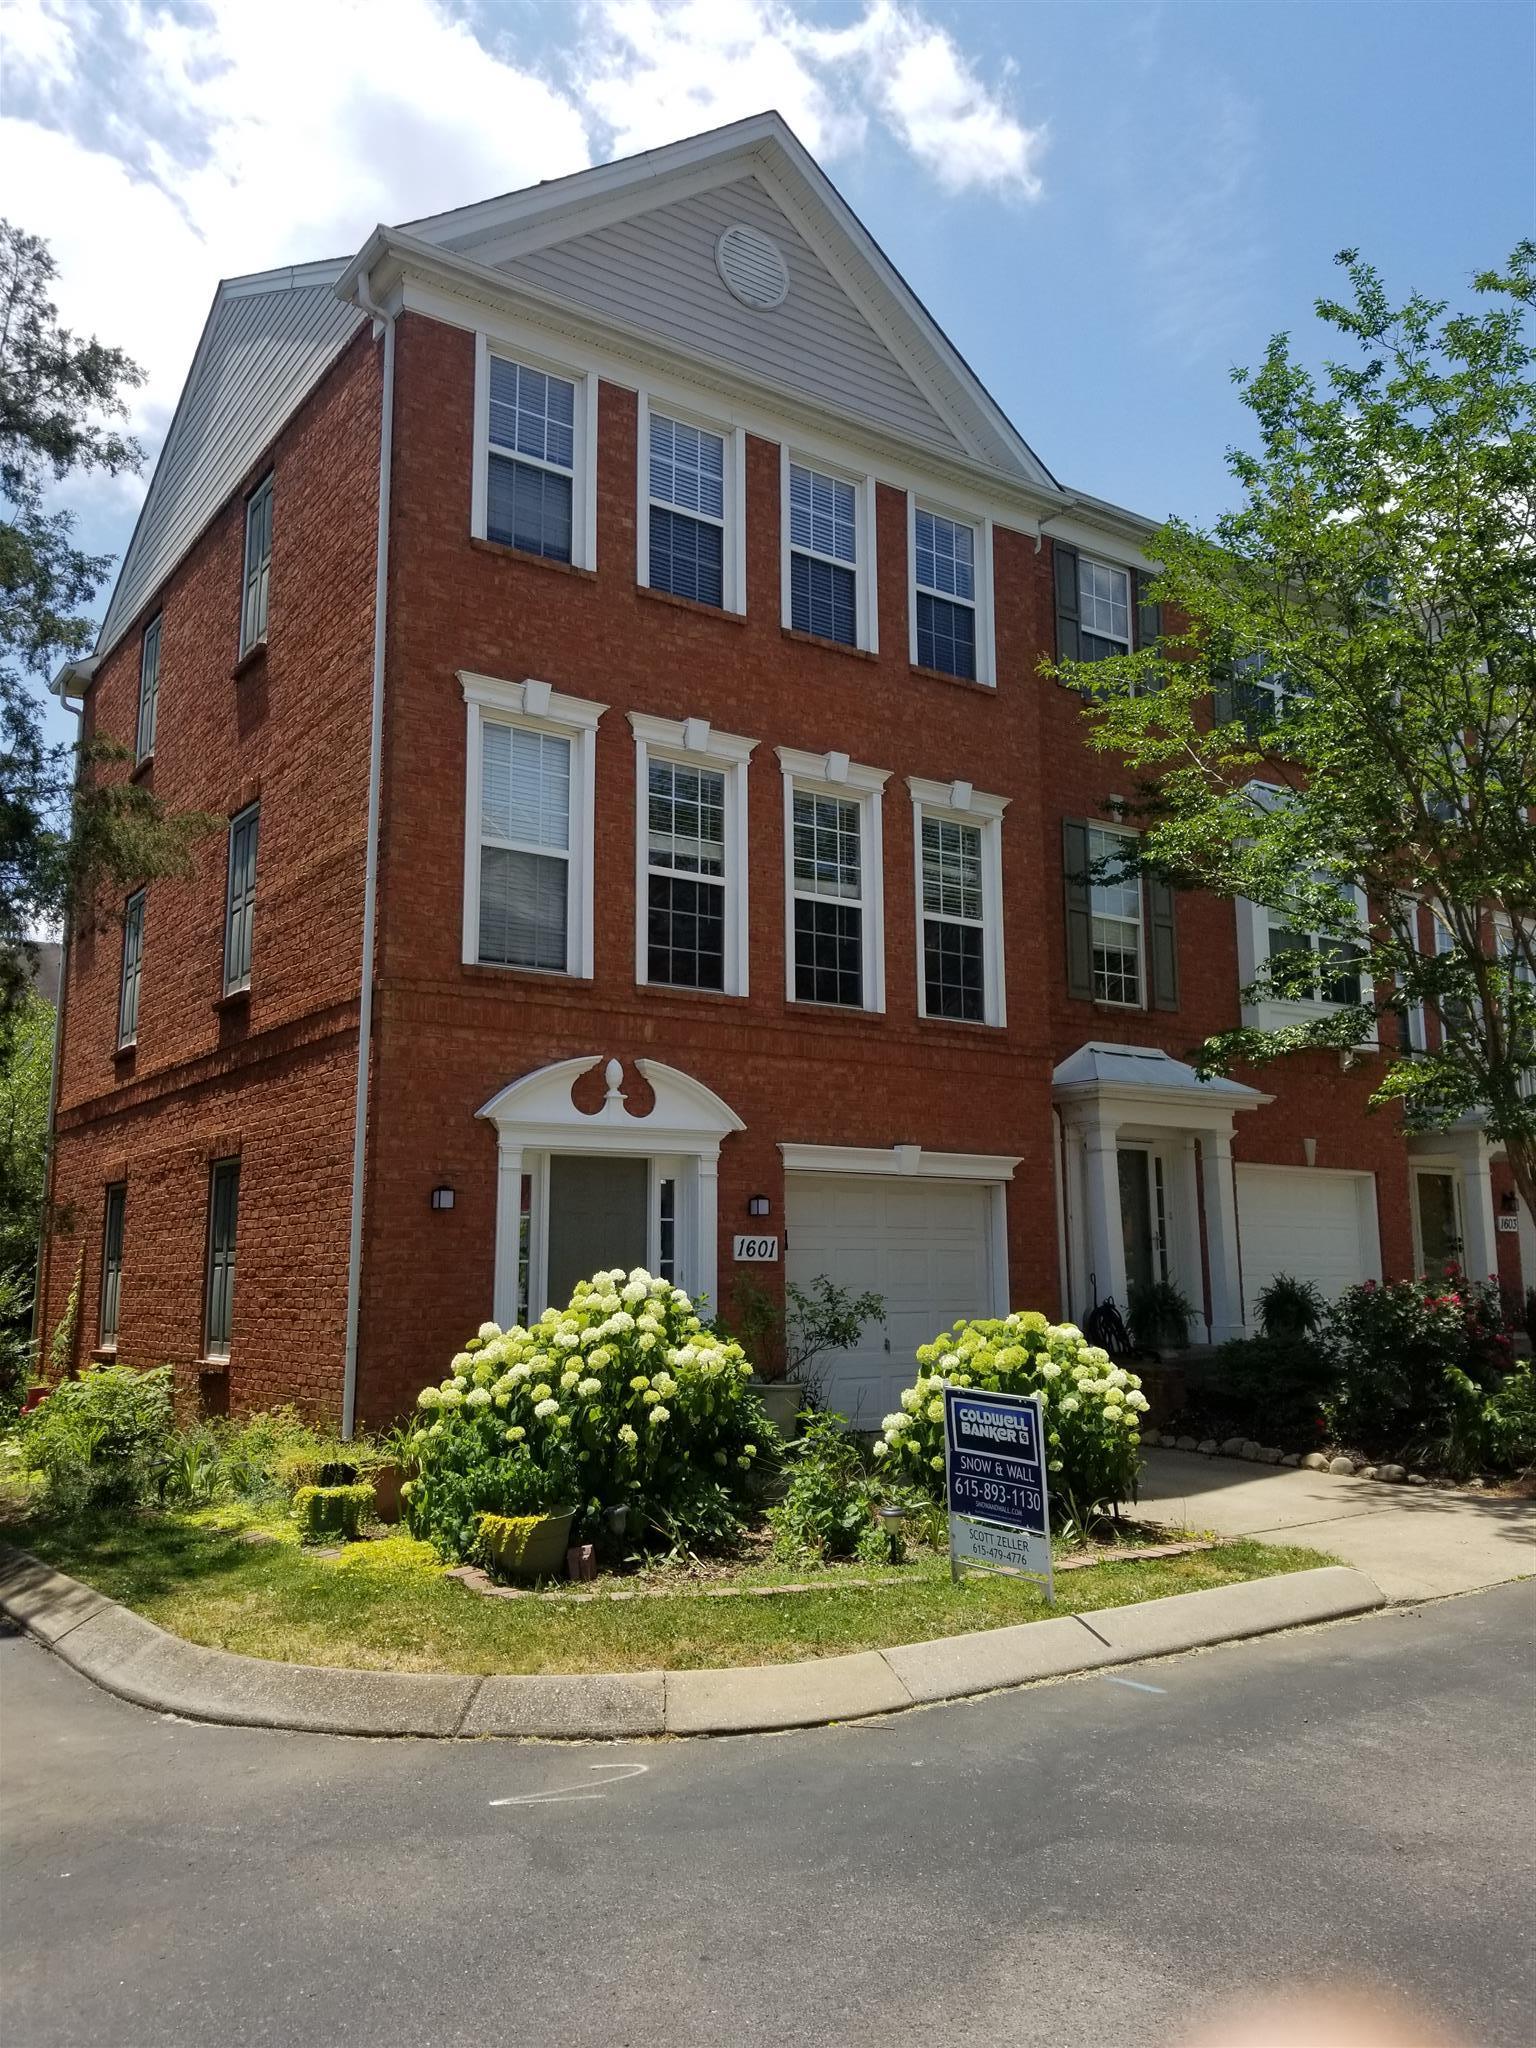 7252 Highway 70 S Apt 1601, Nashville, TN 37221 - Nashville, TN real estate listing